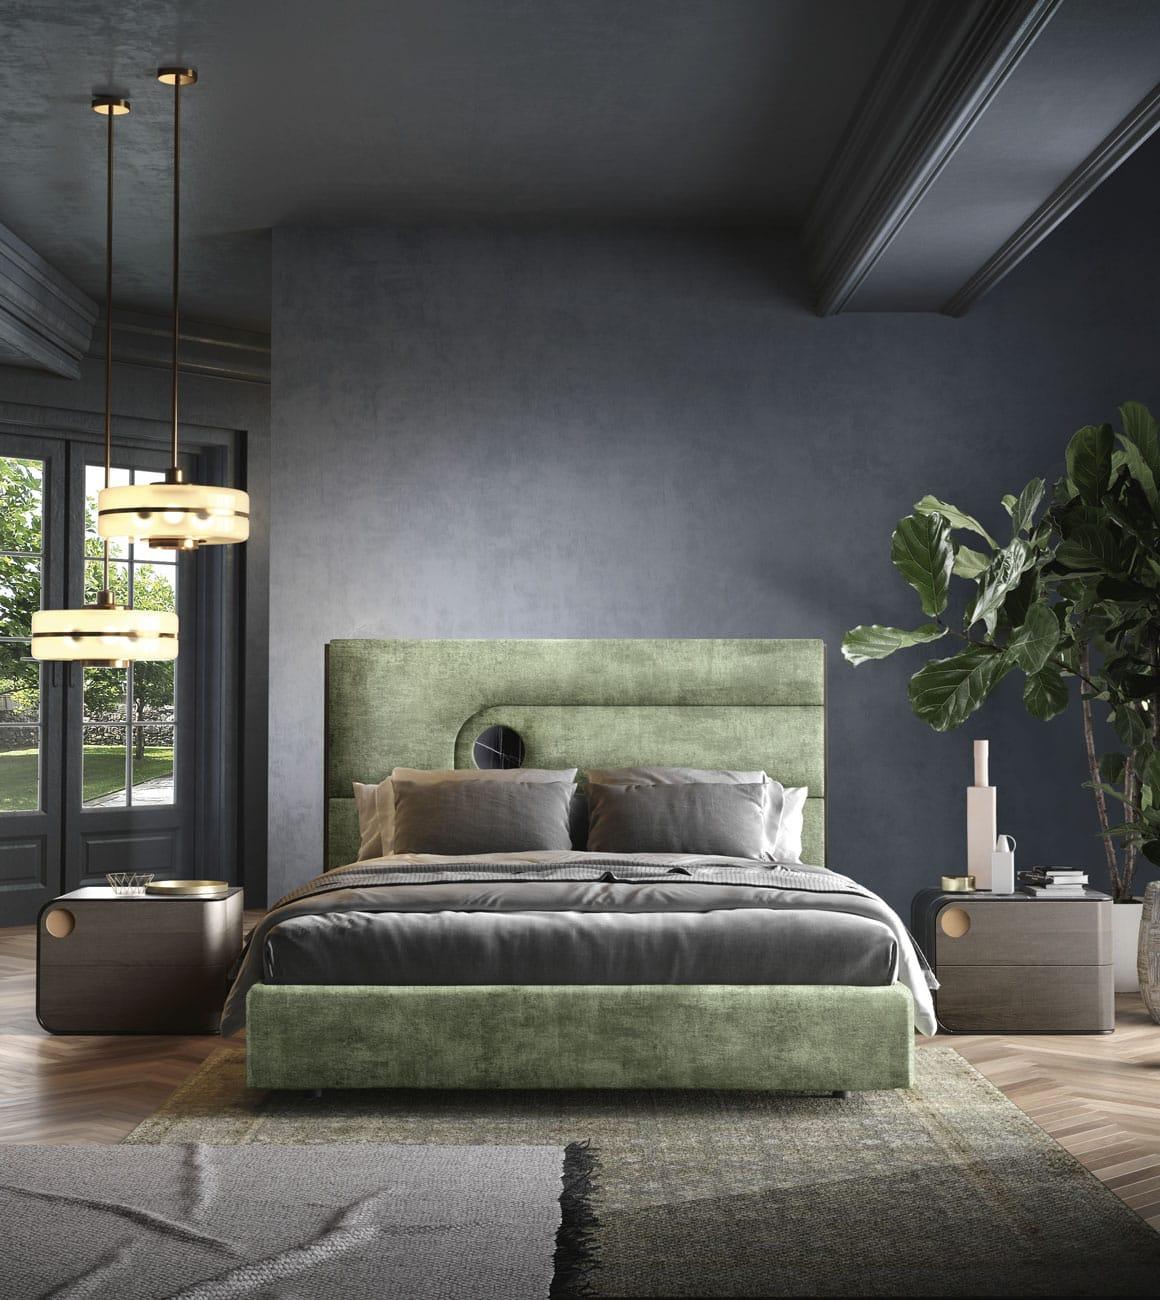 opus-letto-green-adriatica-1.jpg